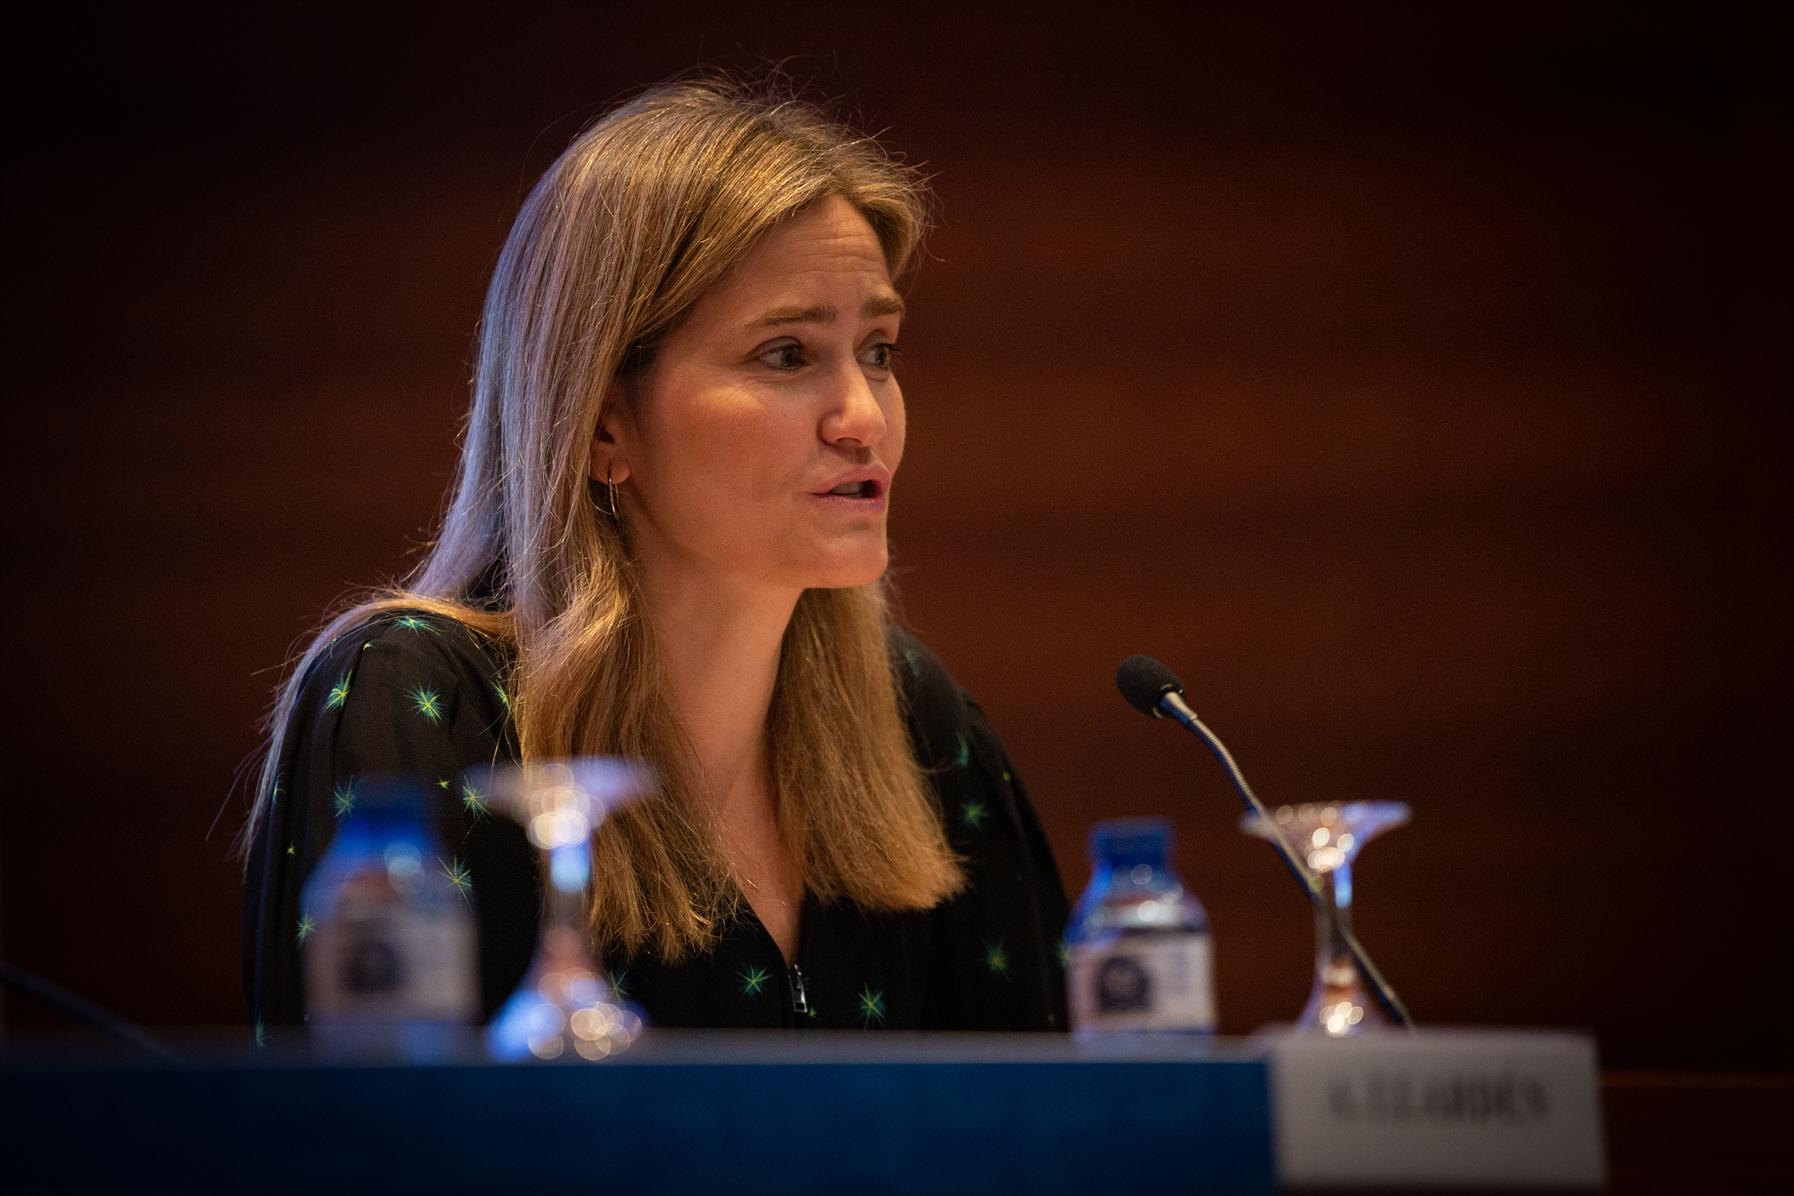 La secretaria de Estado de Energía, Sara Aagesen / David Zorrakino/Europa Press